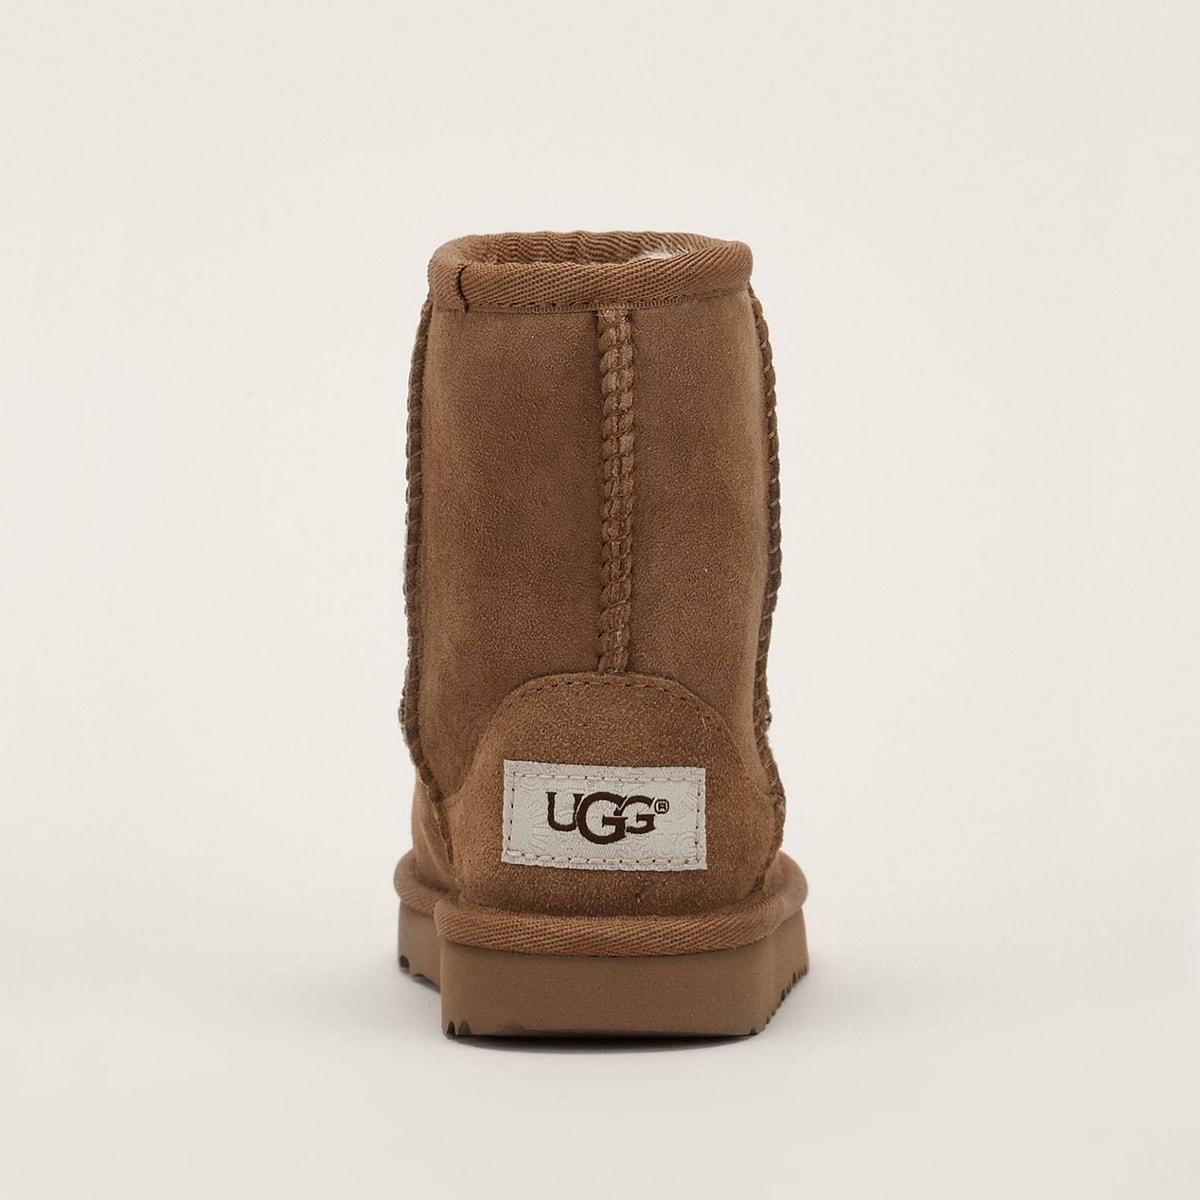 Ugg-Gefutterte-Stiefeletten-Classic-Ii